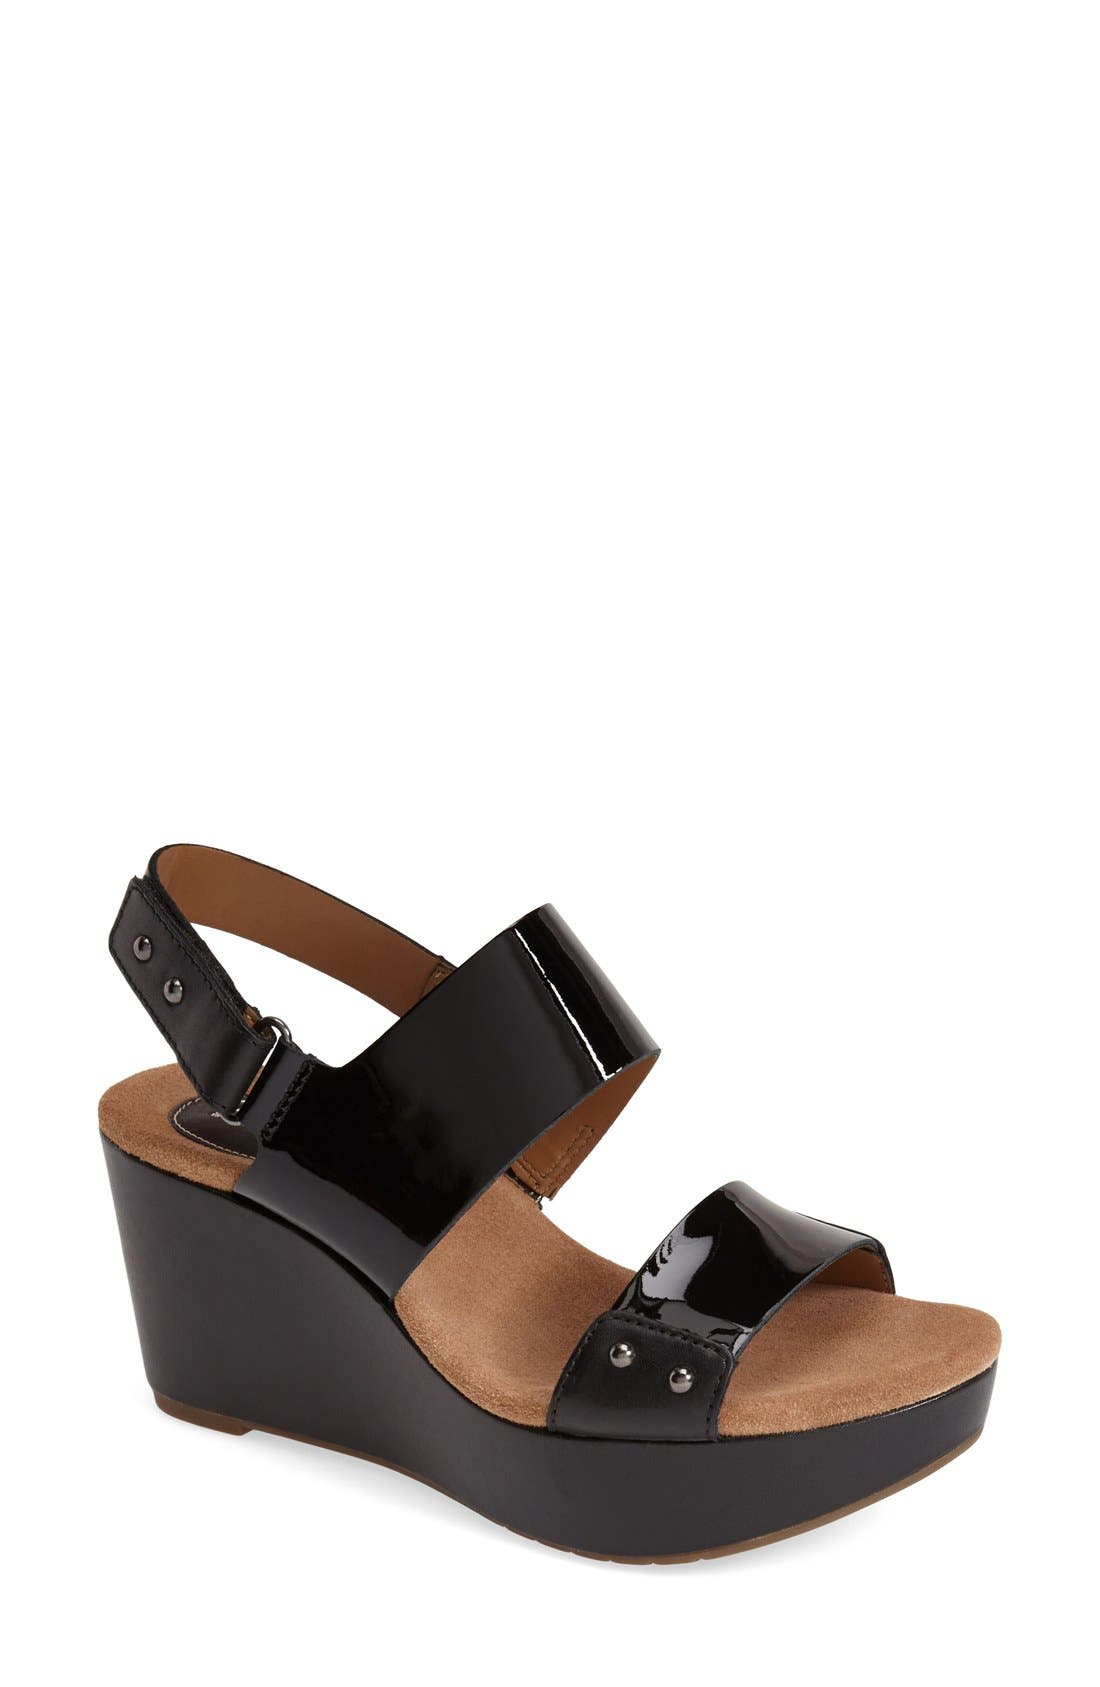 Main Image - Clarks® 'Caslynn Dez' Patent Leather Platform Sandal ...